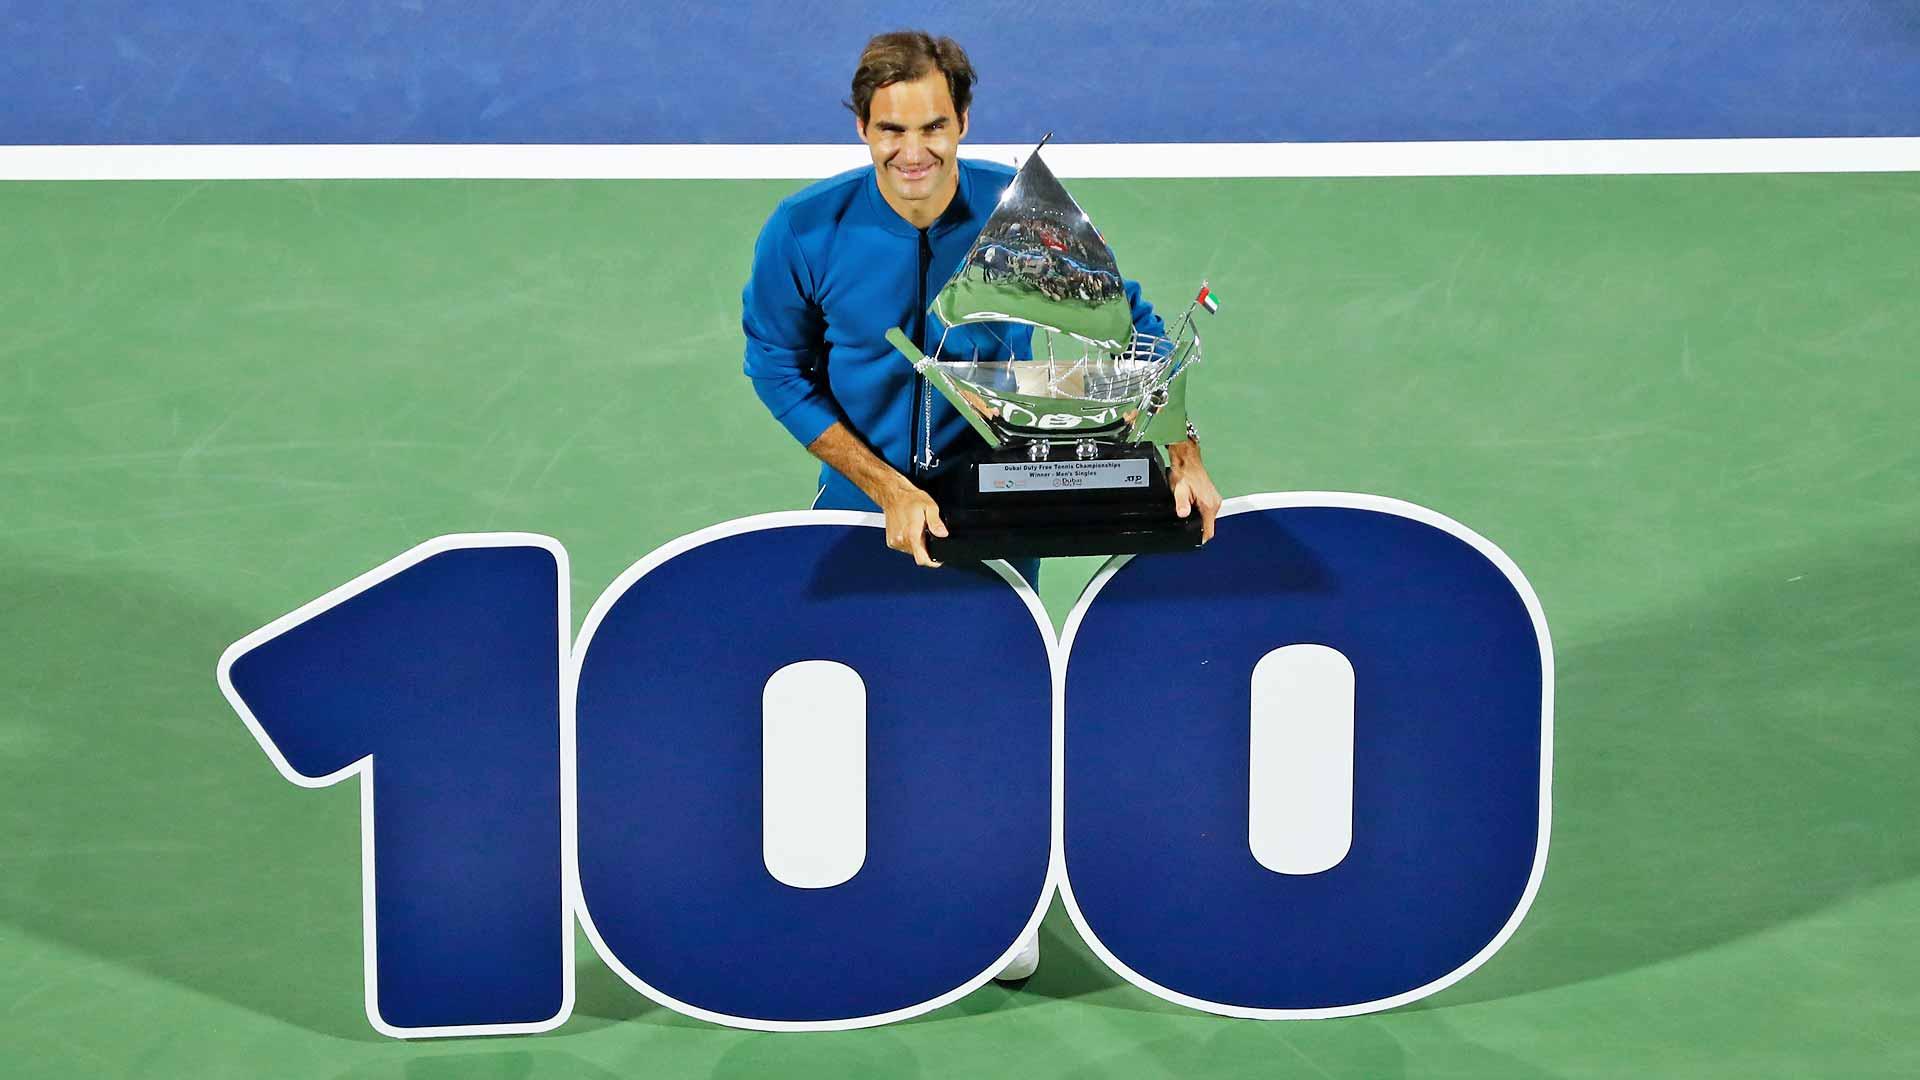 <a href='https://www.atptour.com/en/players/roger-federer/f324/overview'>Roger Federer</a> celebrates his 100th title after triumphing in Dubai